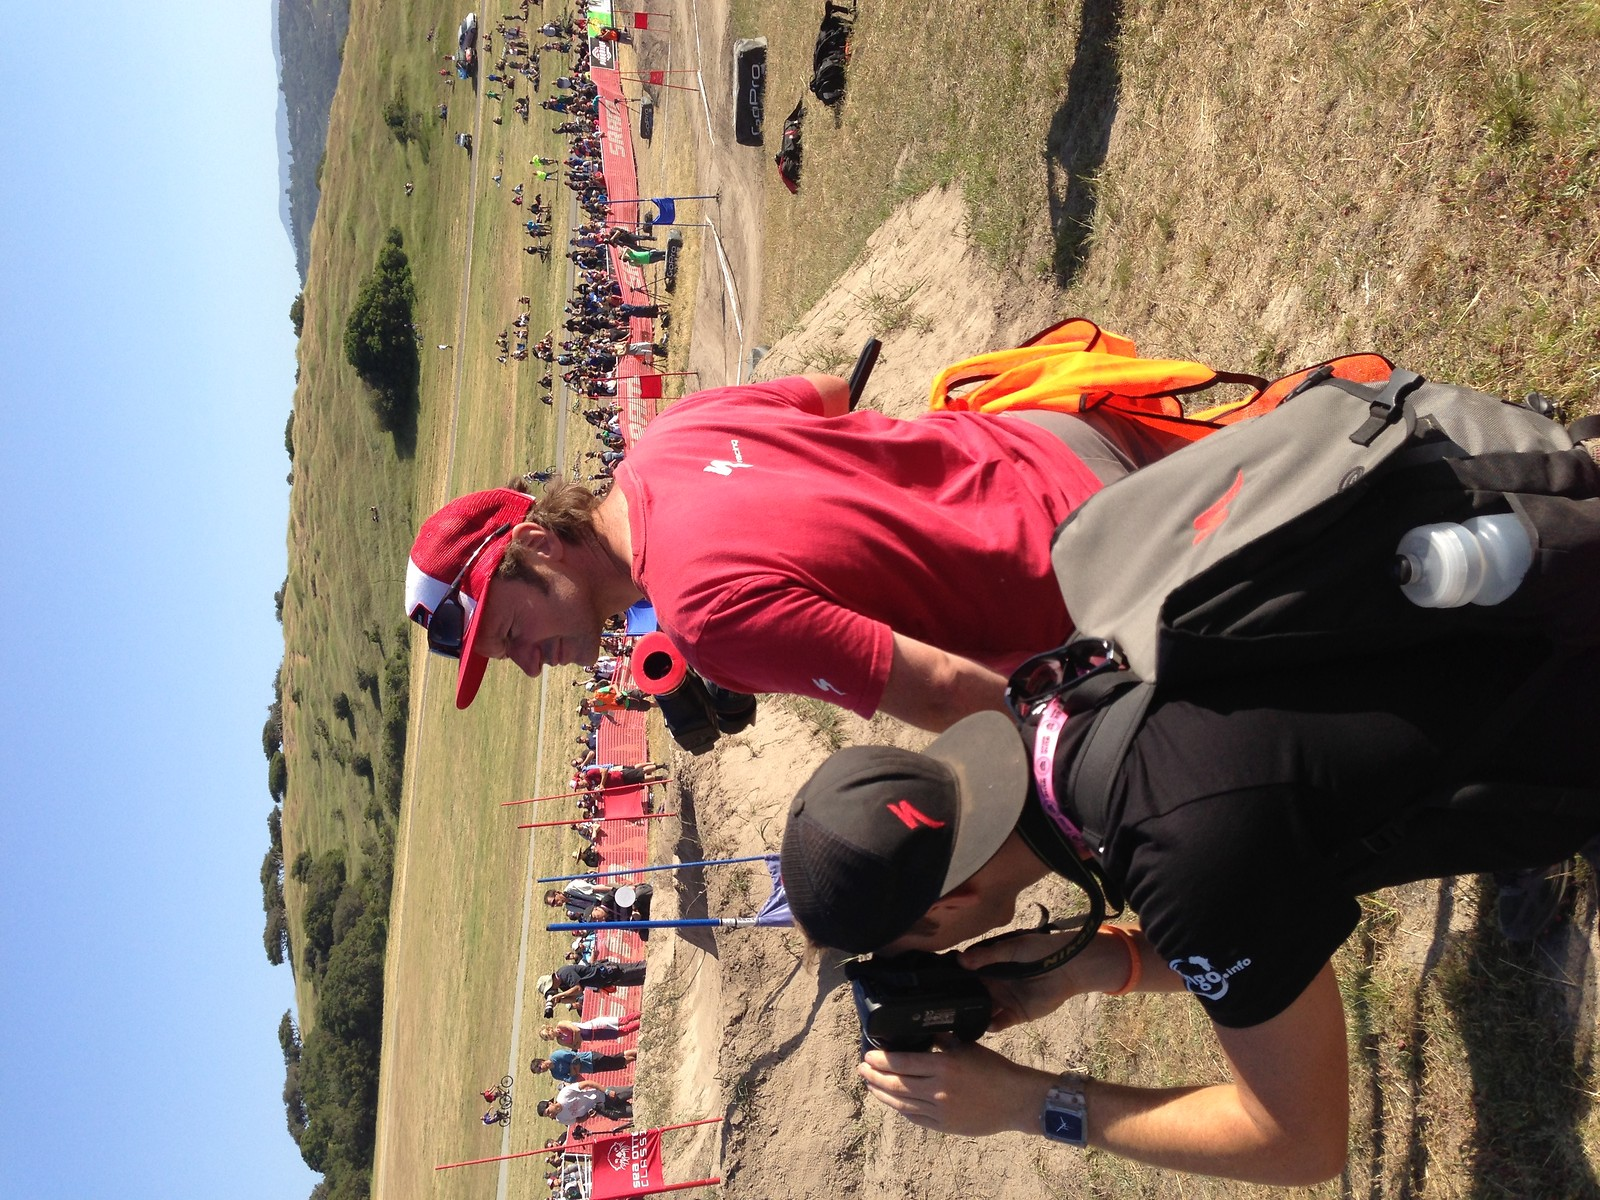 IMG 4233 - ska todd - Mountain Biking Pictures - Vital MTB